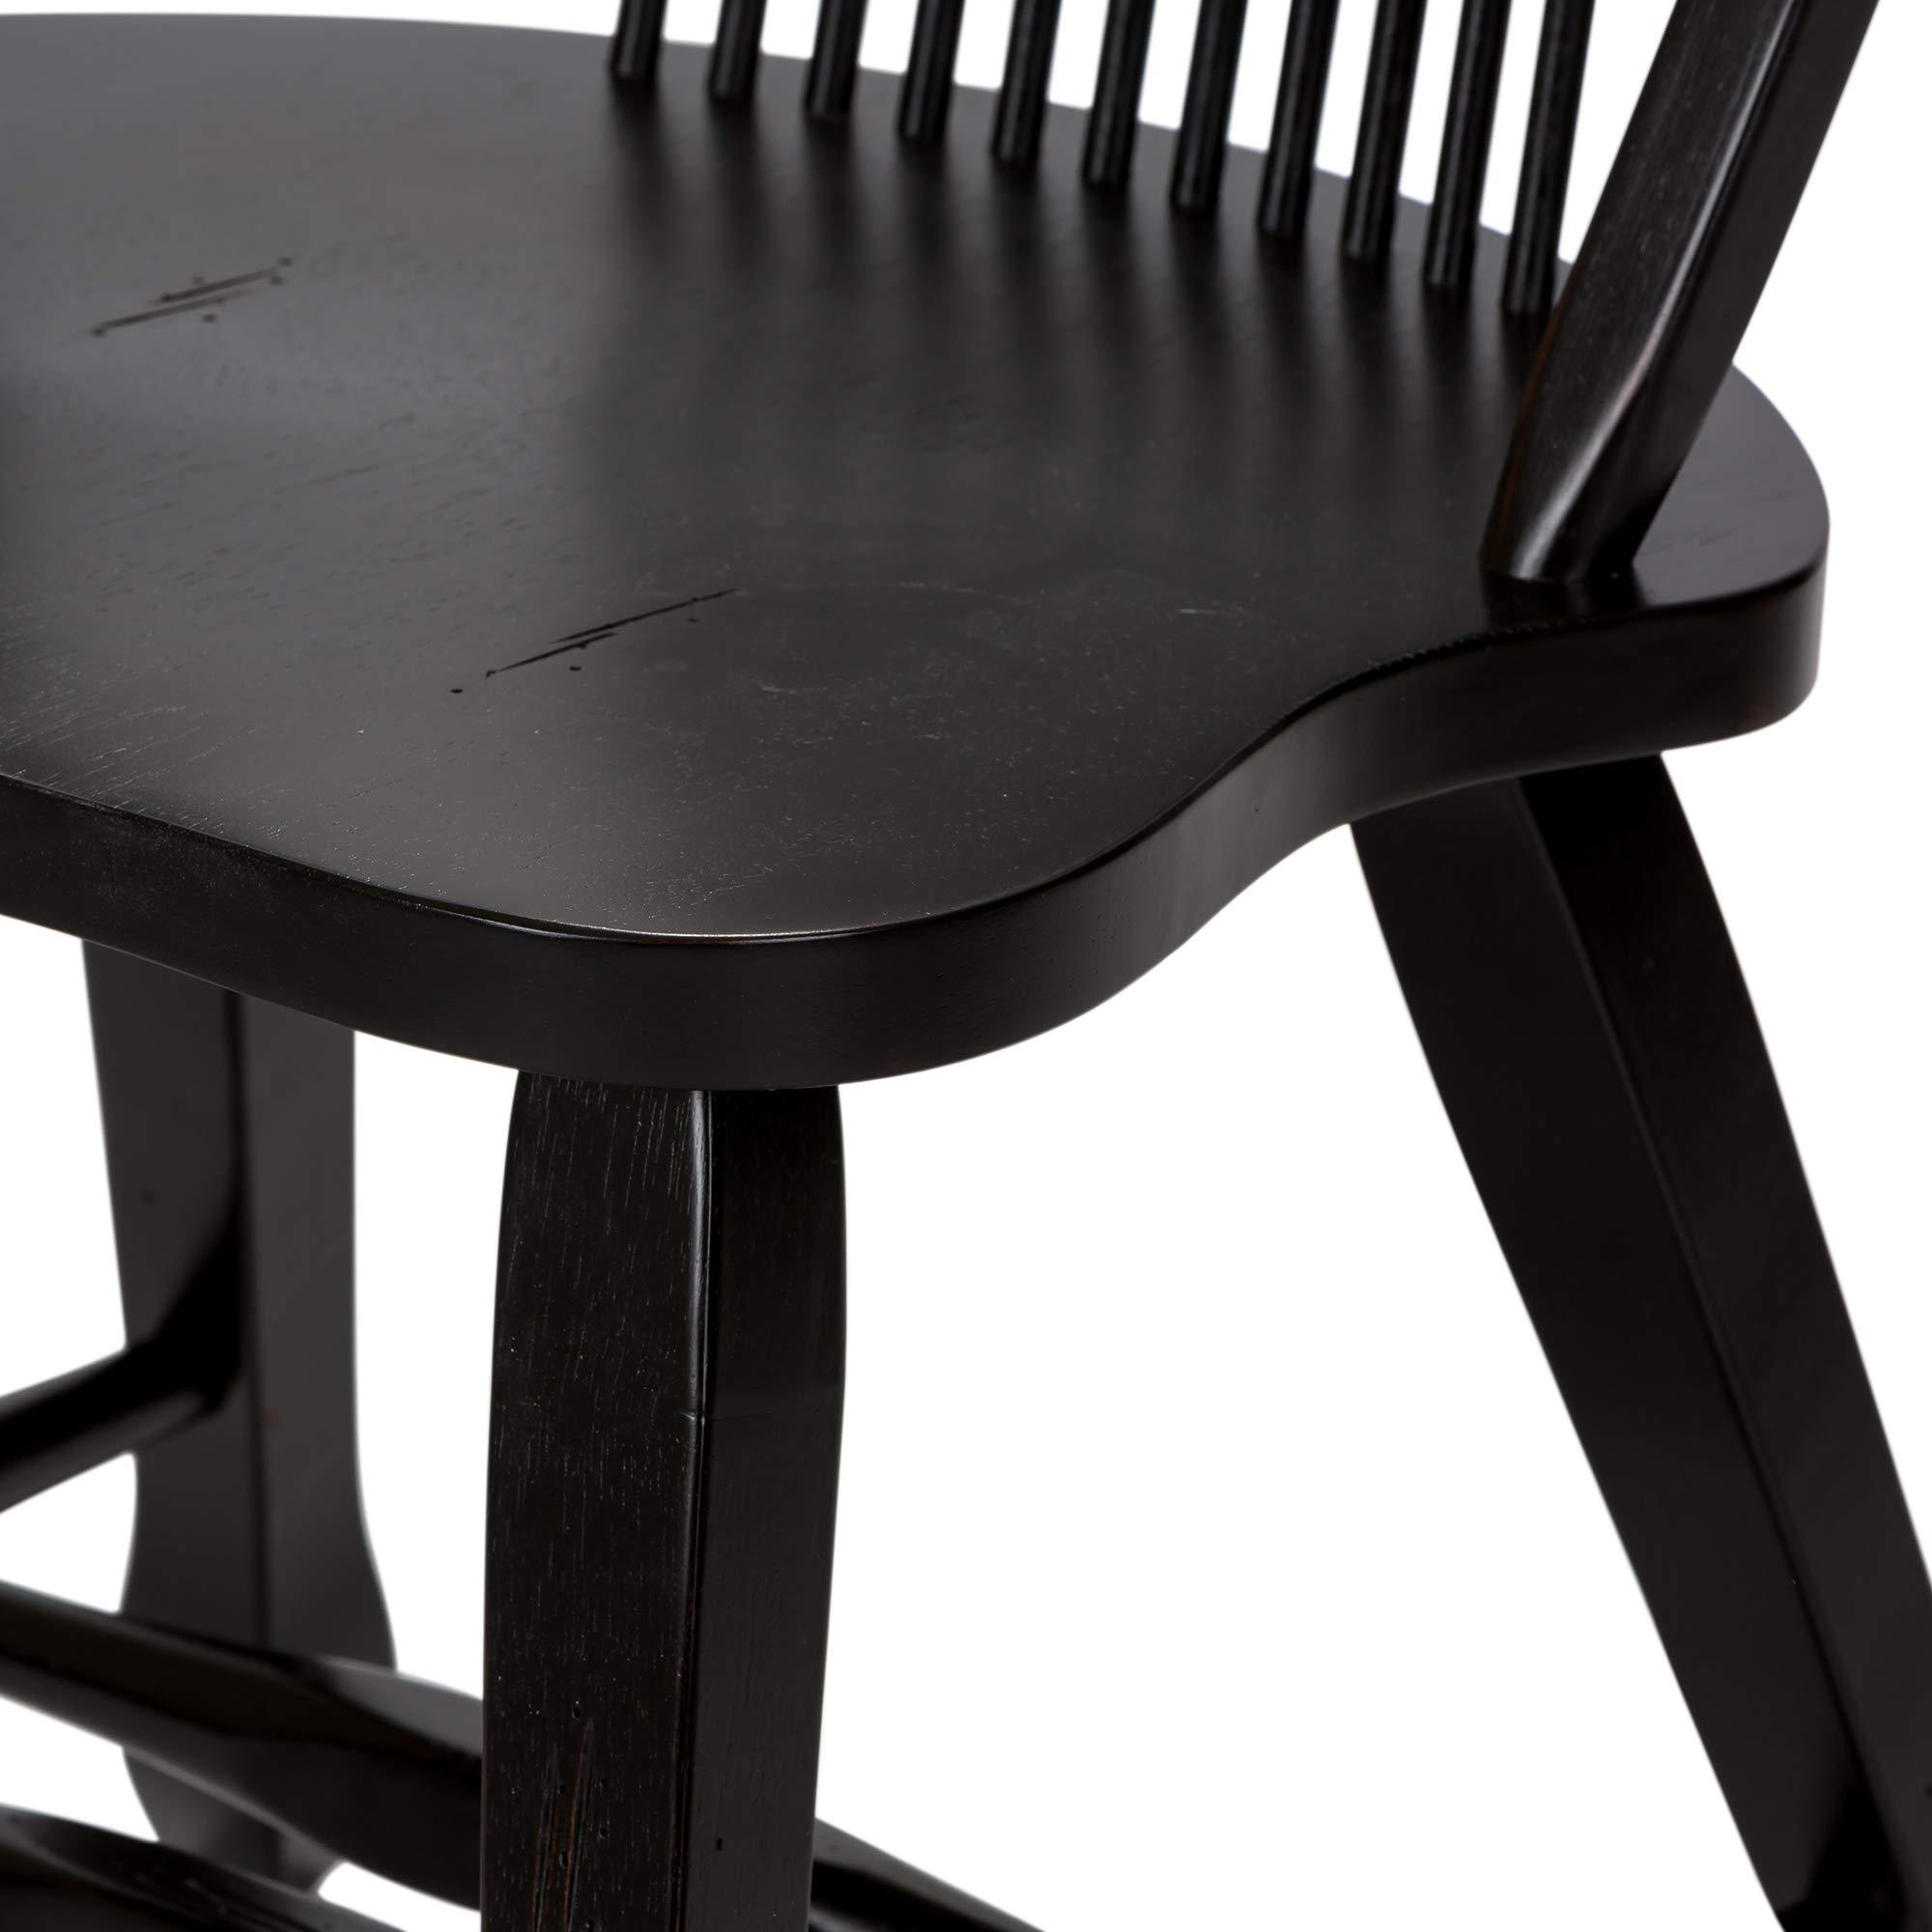 Liberty Furniture Industries 17-C4032 Sheaf Back Side Chair, Black by Liberty Furniture INDUSTRIES